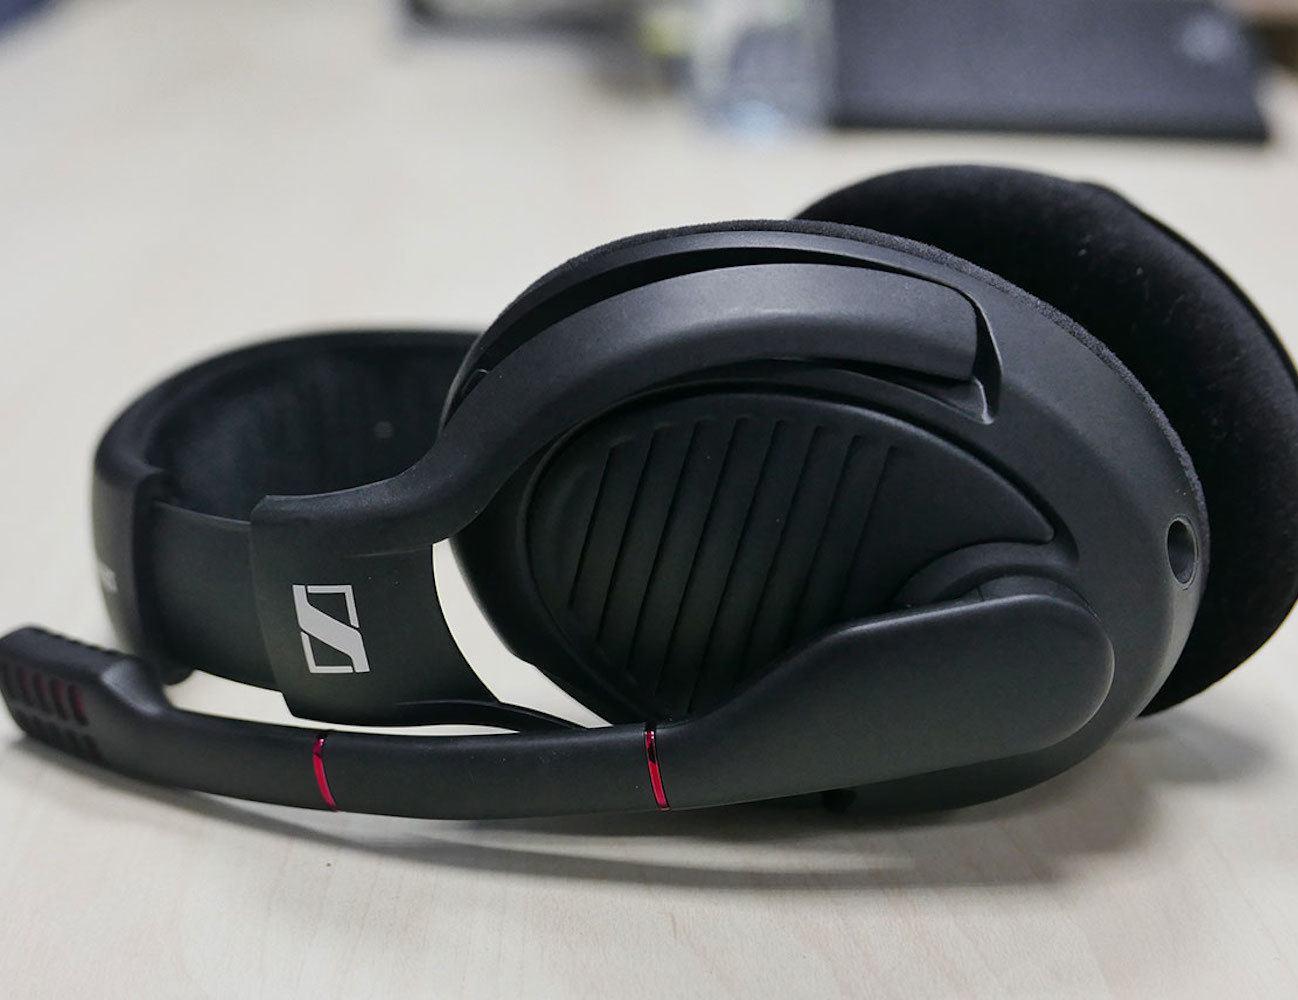 how to clean sennheiser headsets